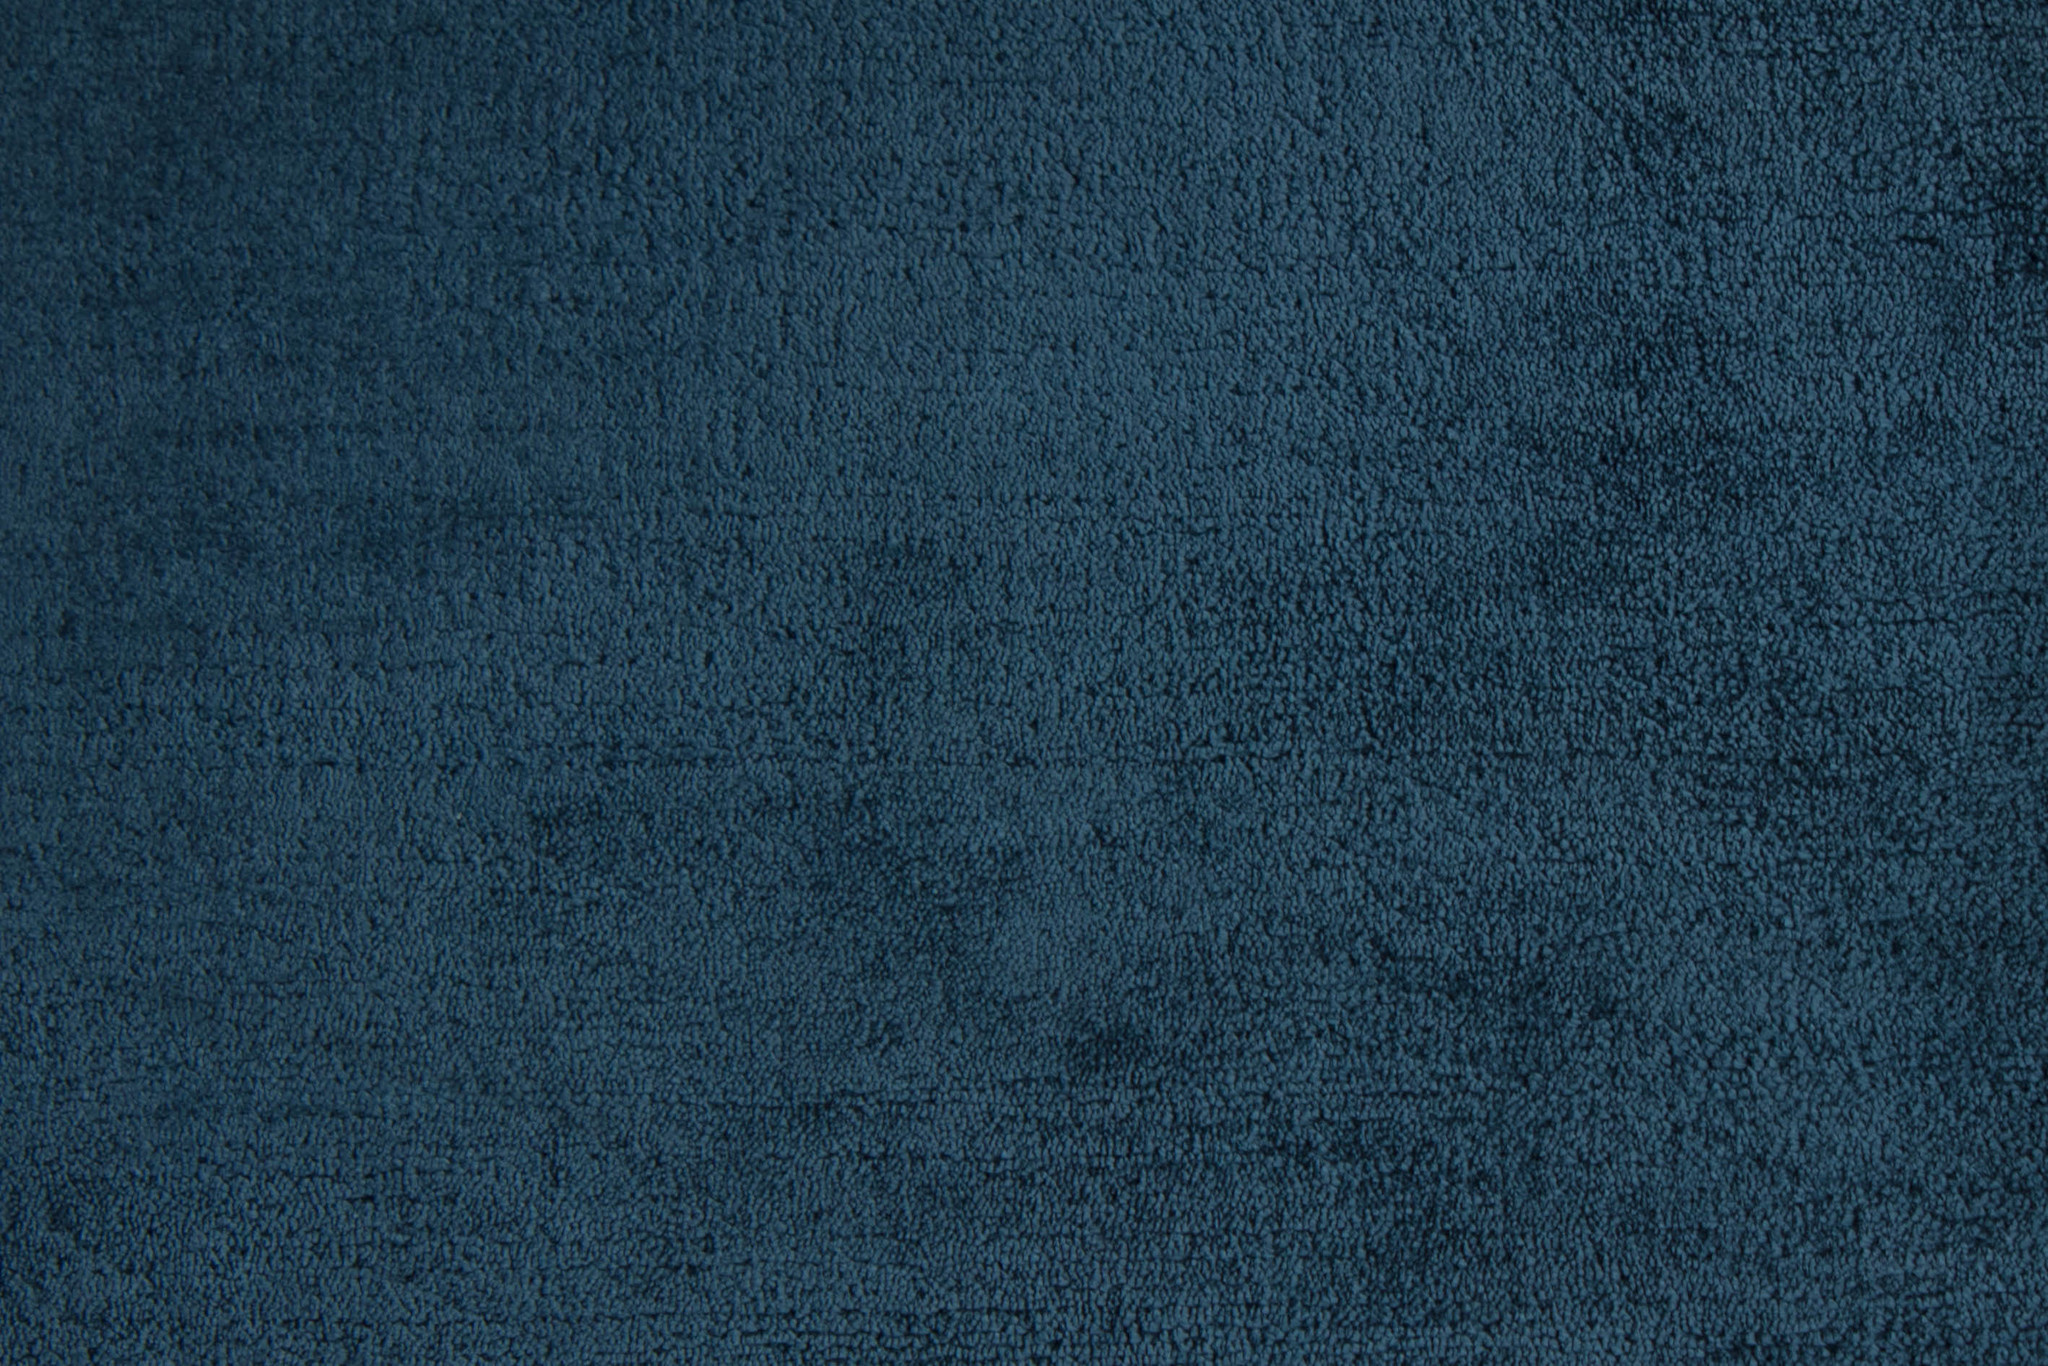 PARMA Carpet Dark Denim 200x300-1